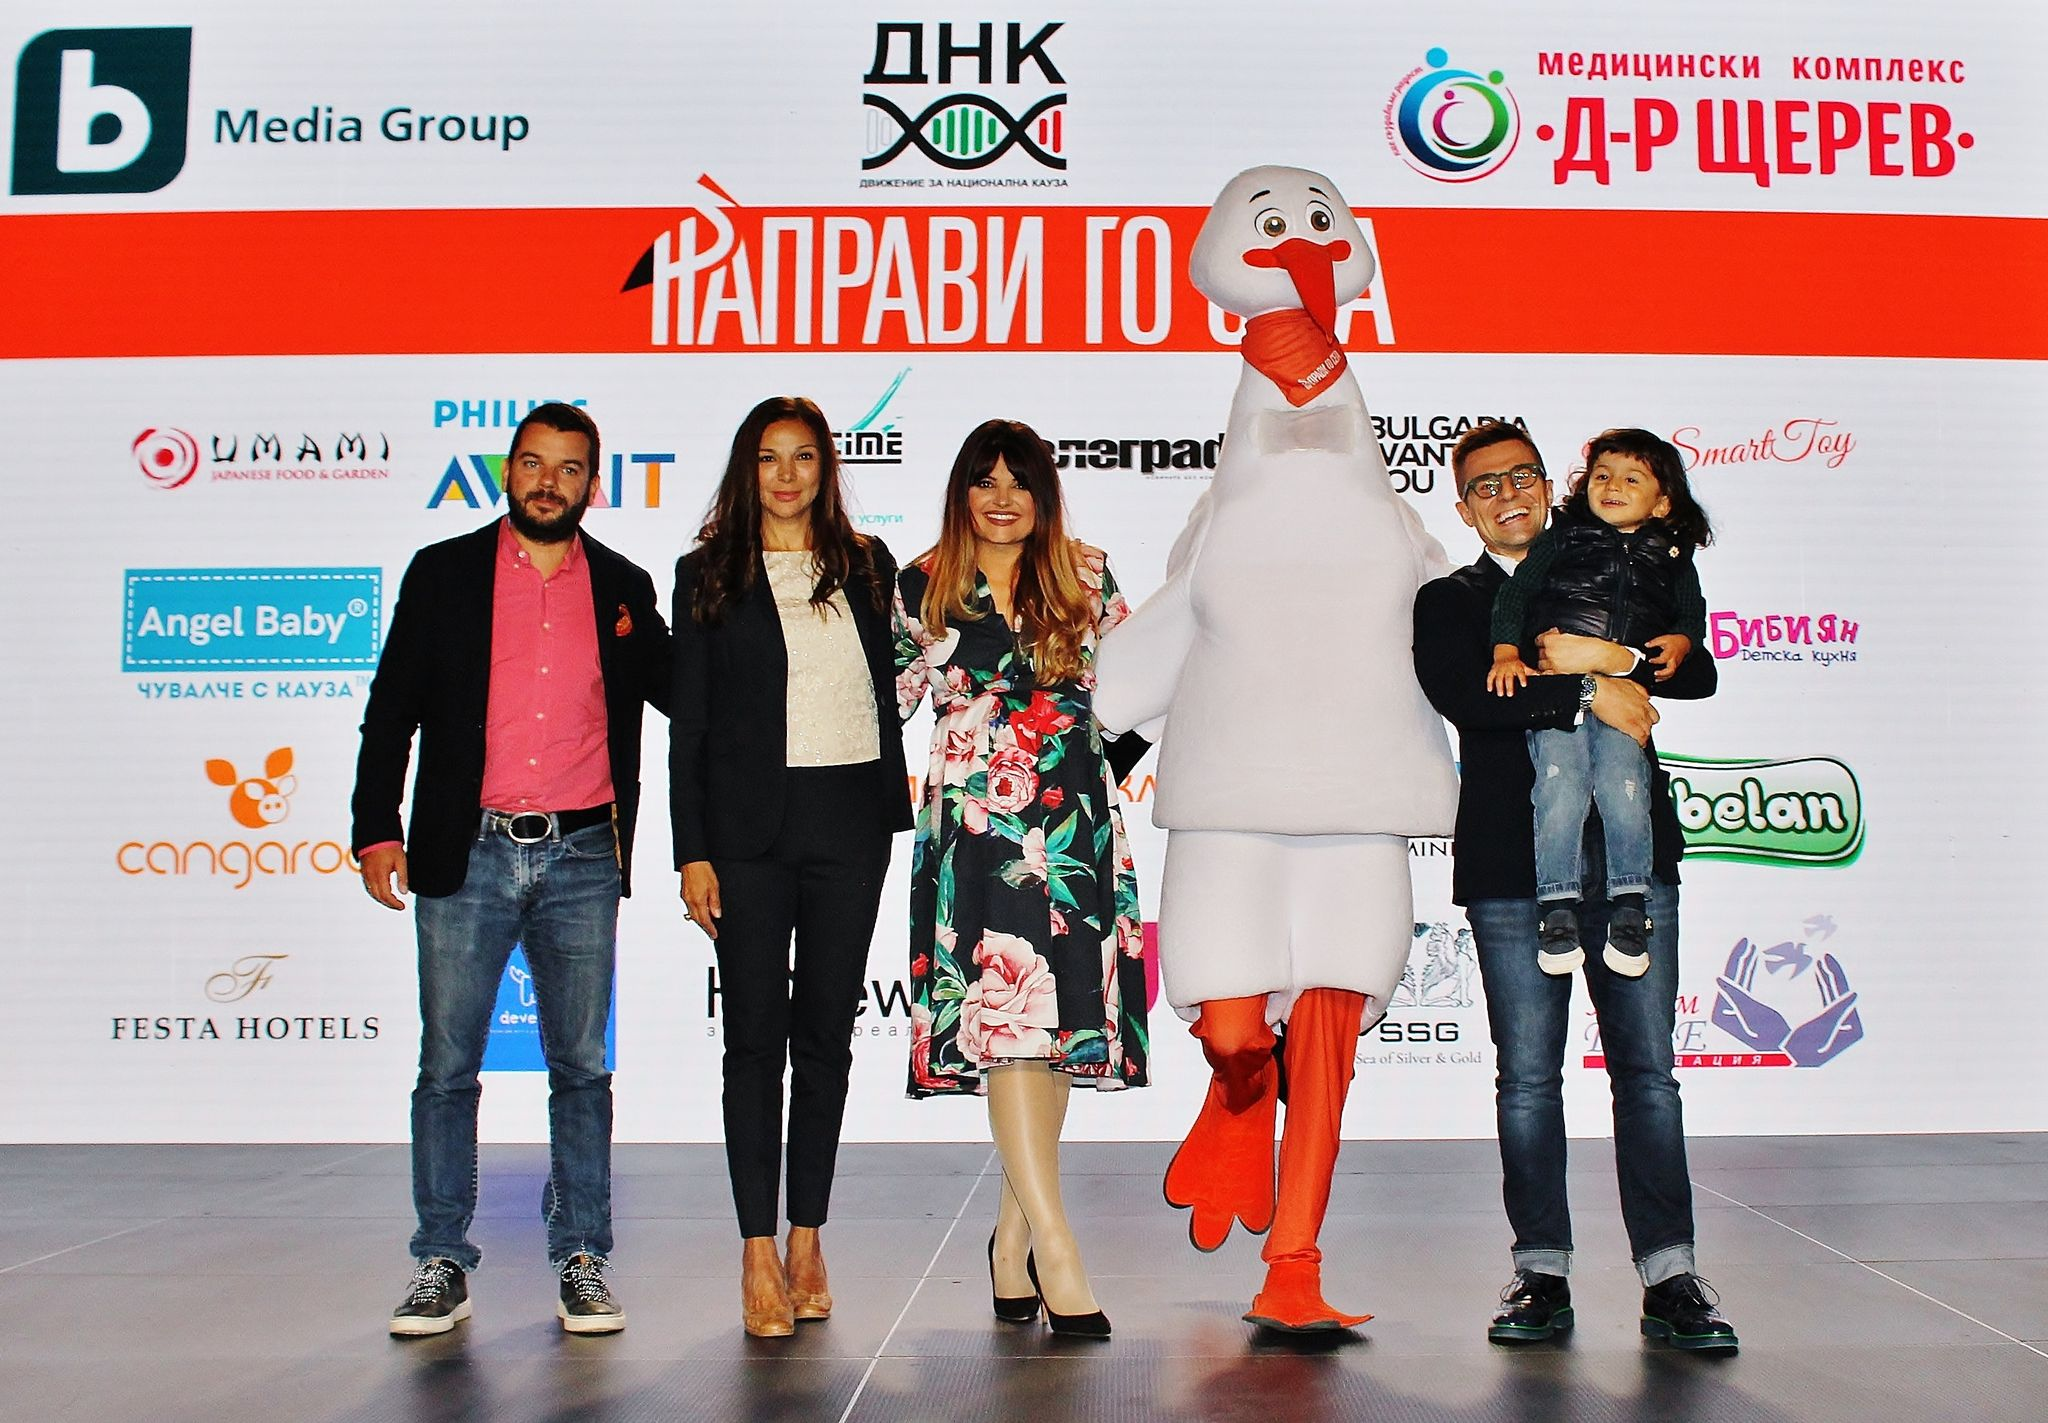 Иван Христов, Юлиана Дончева, Петя Дикова и Андрей Арнаудов със сина си Васил